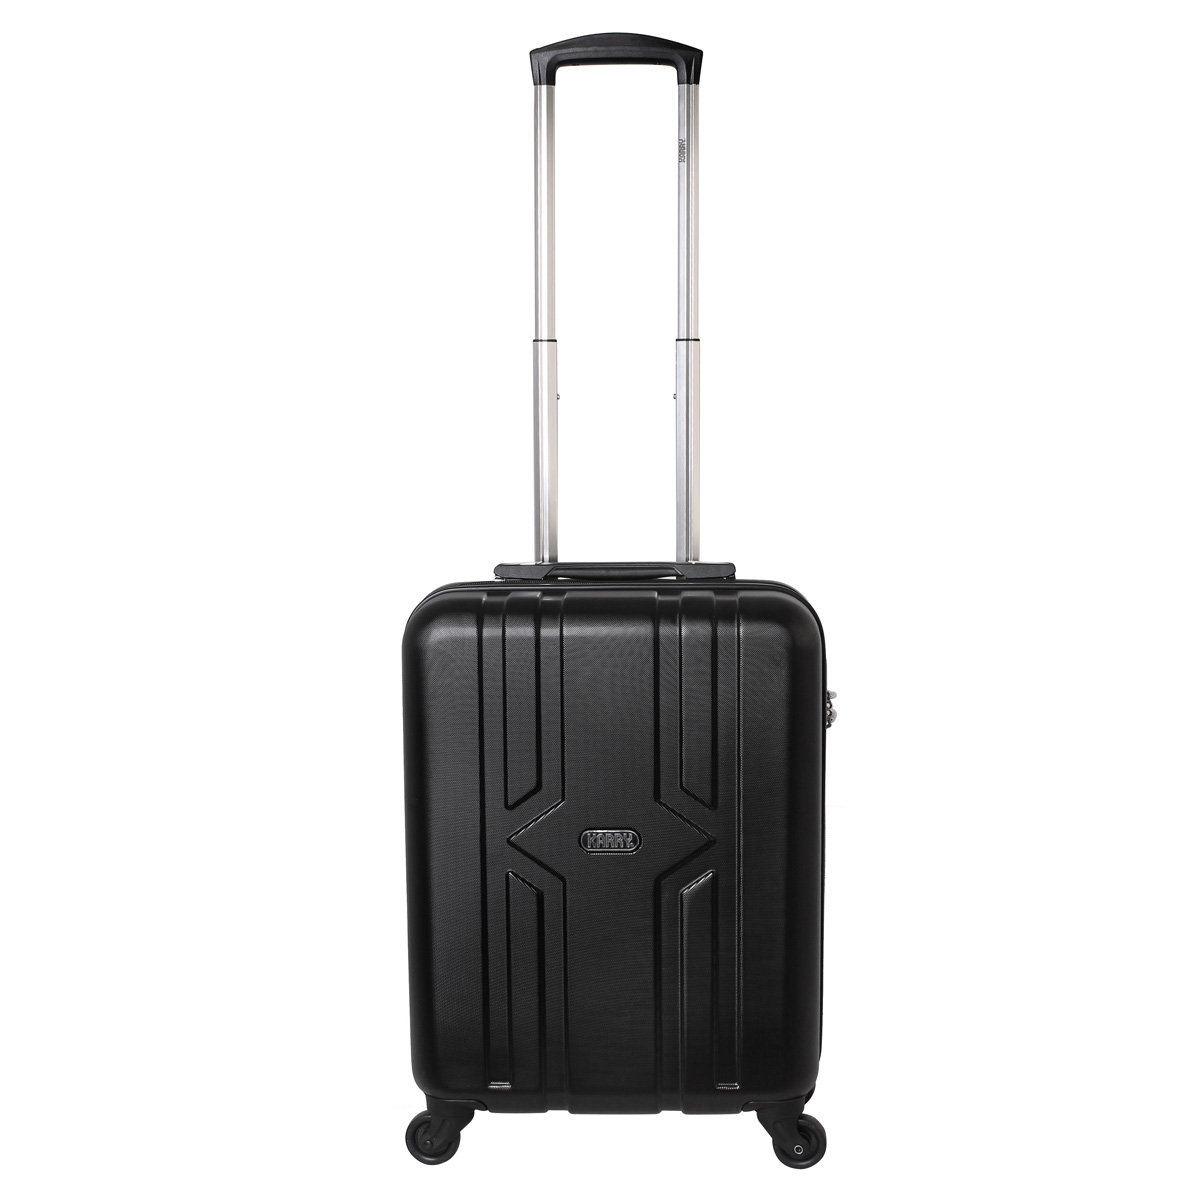 handgep ck hartschalen koffer trolley kurzreisen tsa schloss schwarz 821 ebay. Black Bedroom Furniture Sets. Home Design Ideas